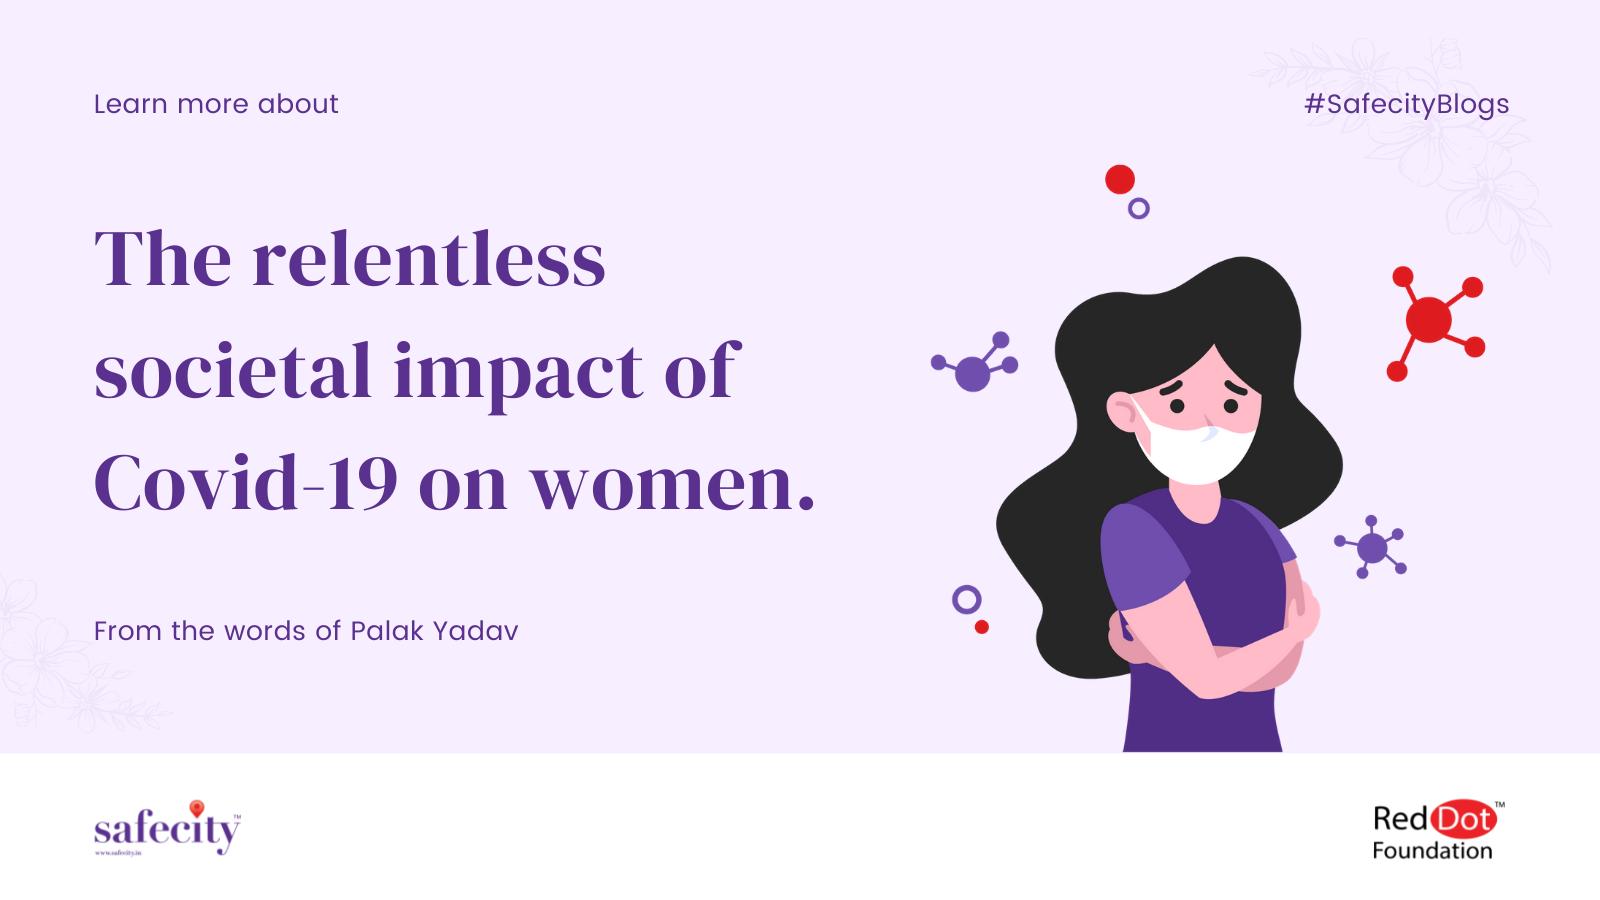 Covid-19 & the relentless societal impact of it on women